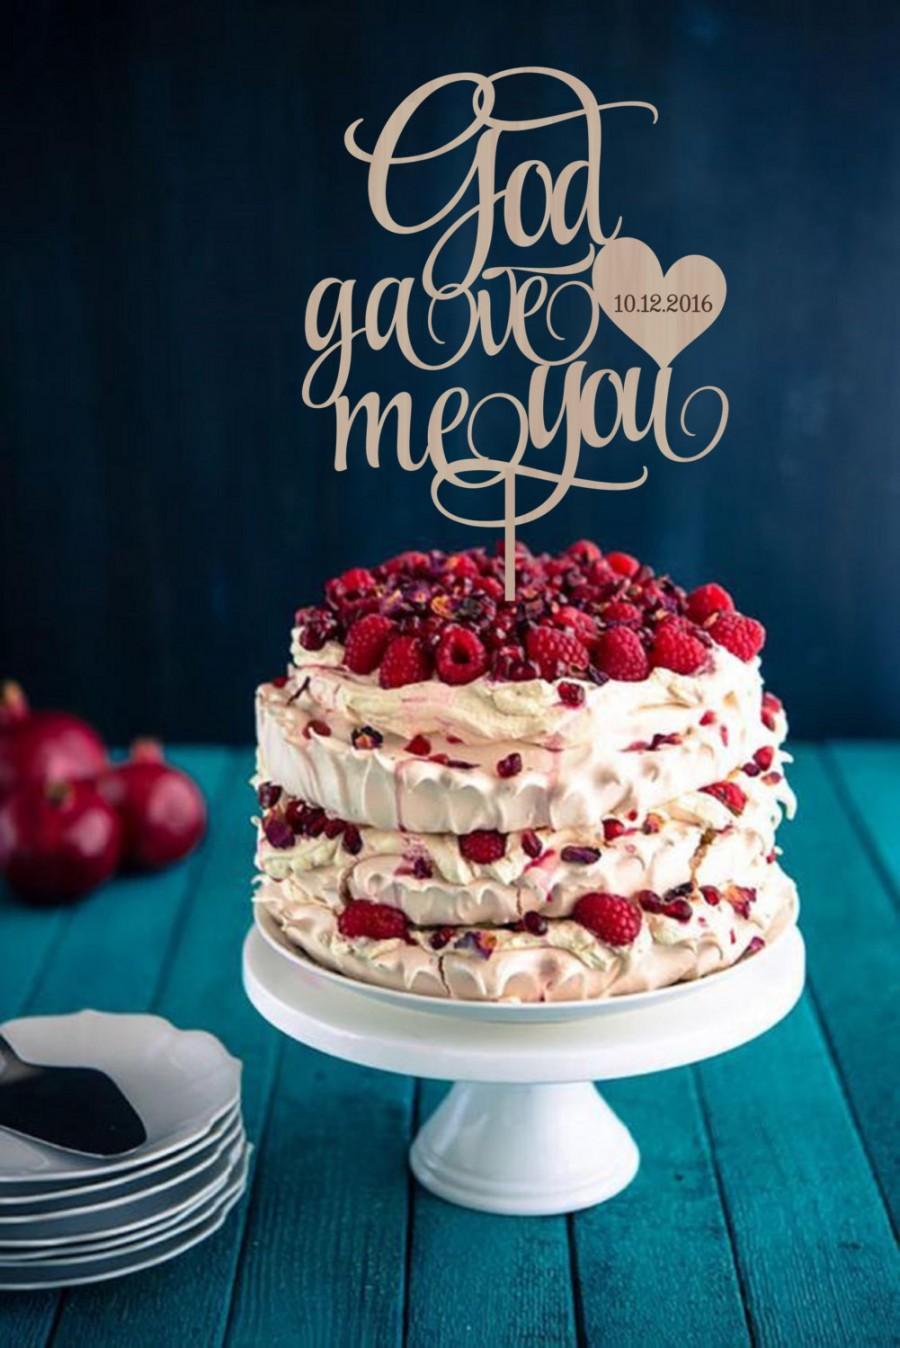 Свадьба - Wedding Cake Topper God Gave Me You  Custom Cake Topper Wedding Sign Rustic Wedding Cake Topper Wood Silver Gold